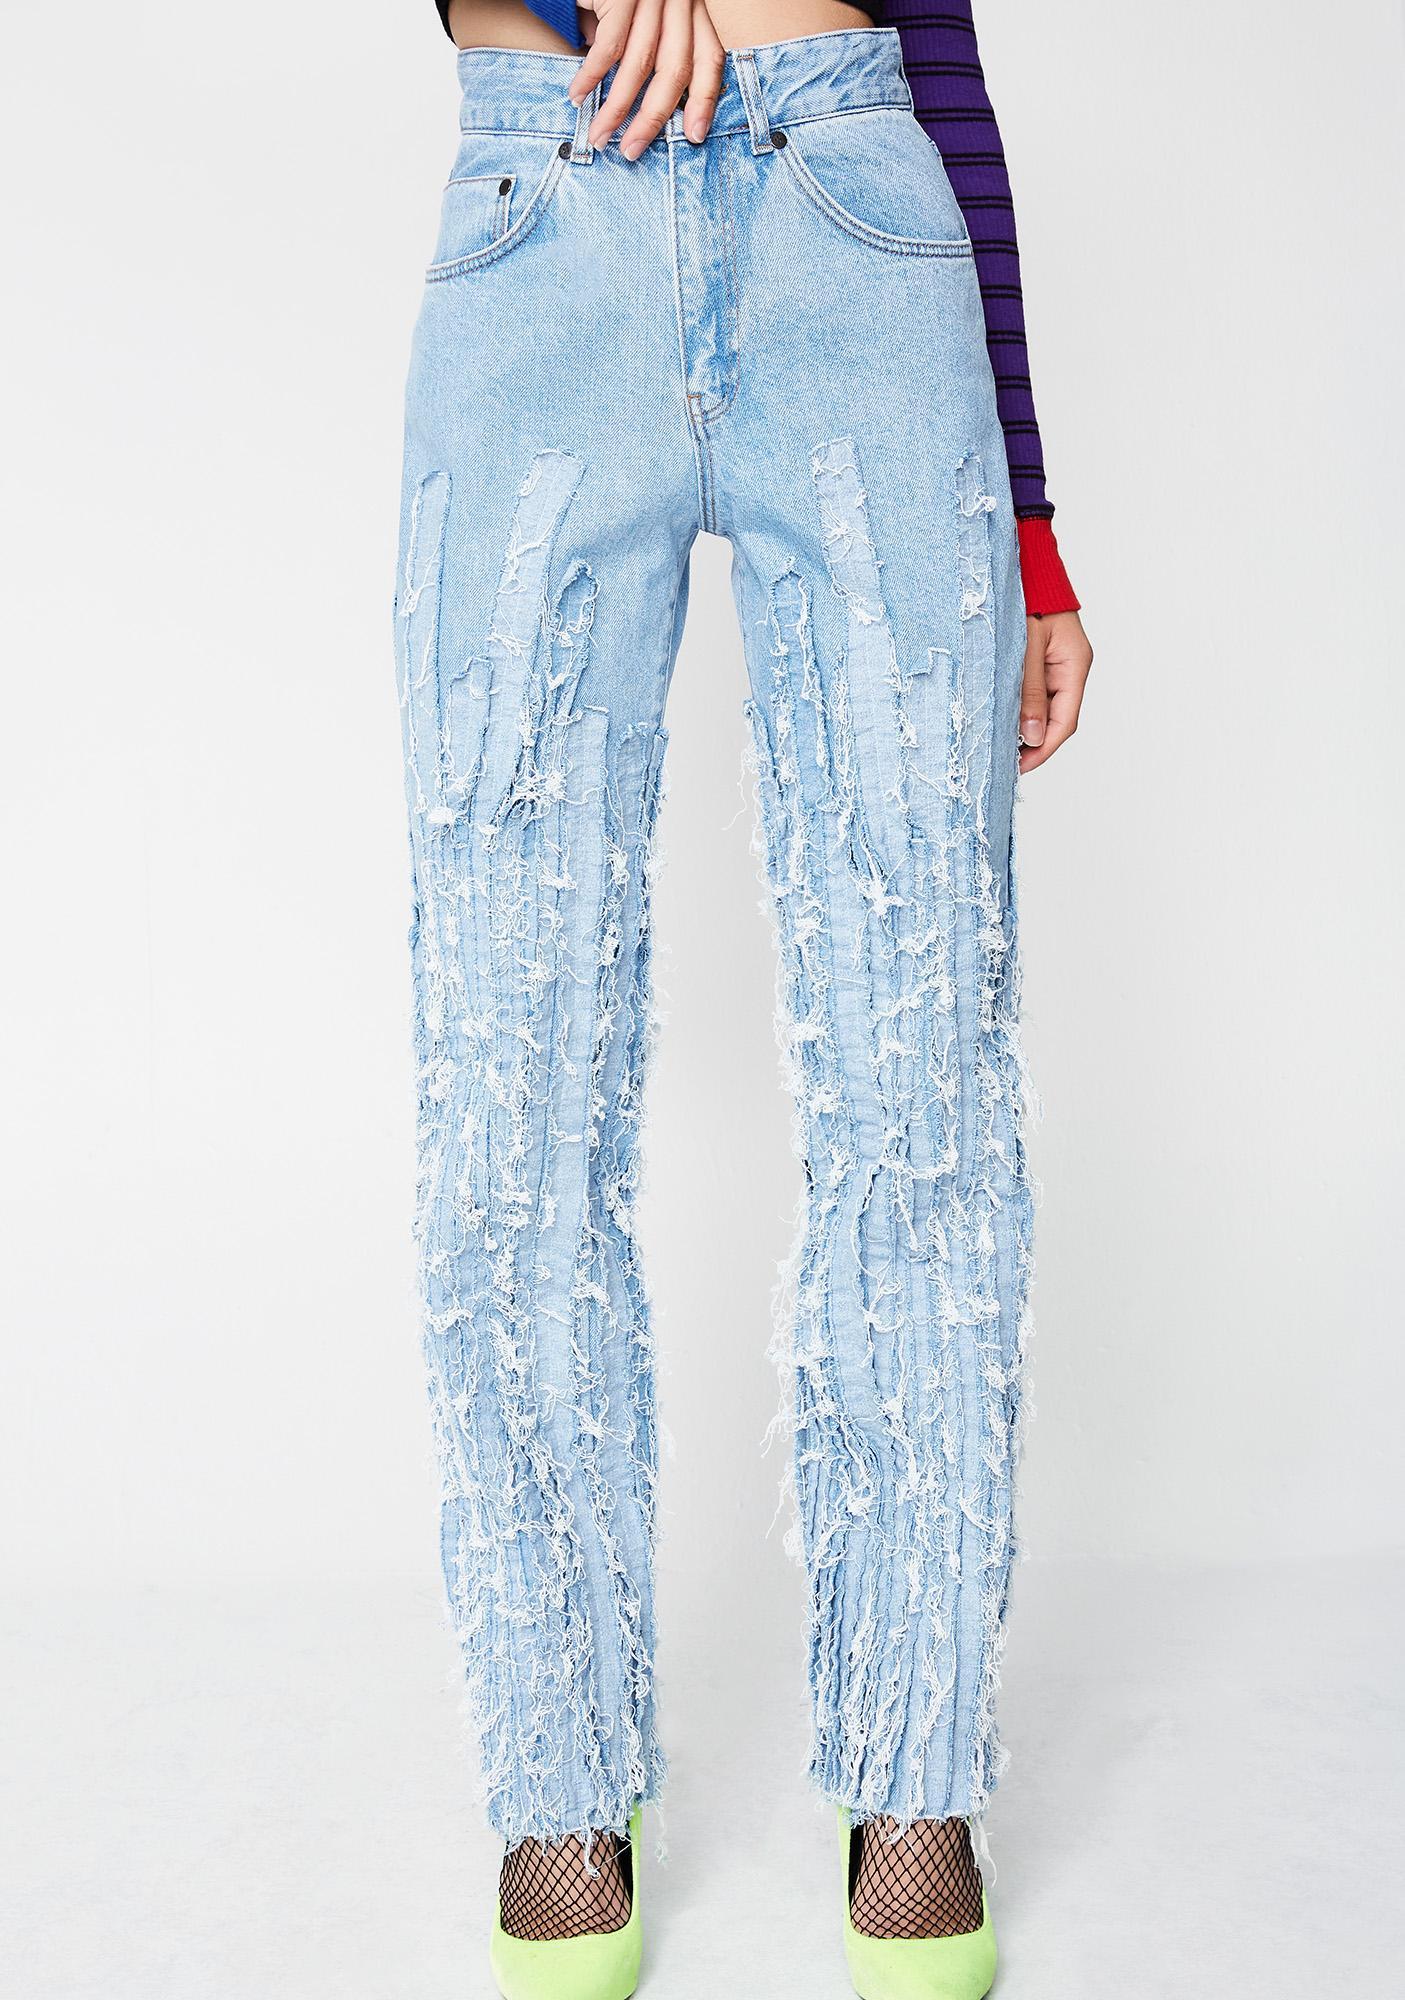 The Ragged Priest Strip Jeans